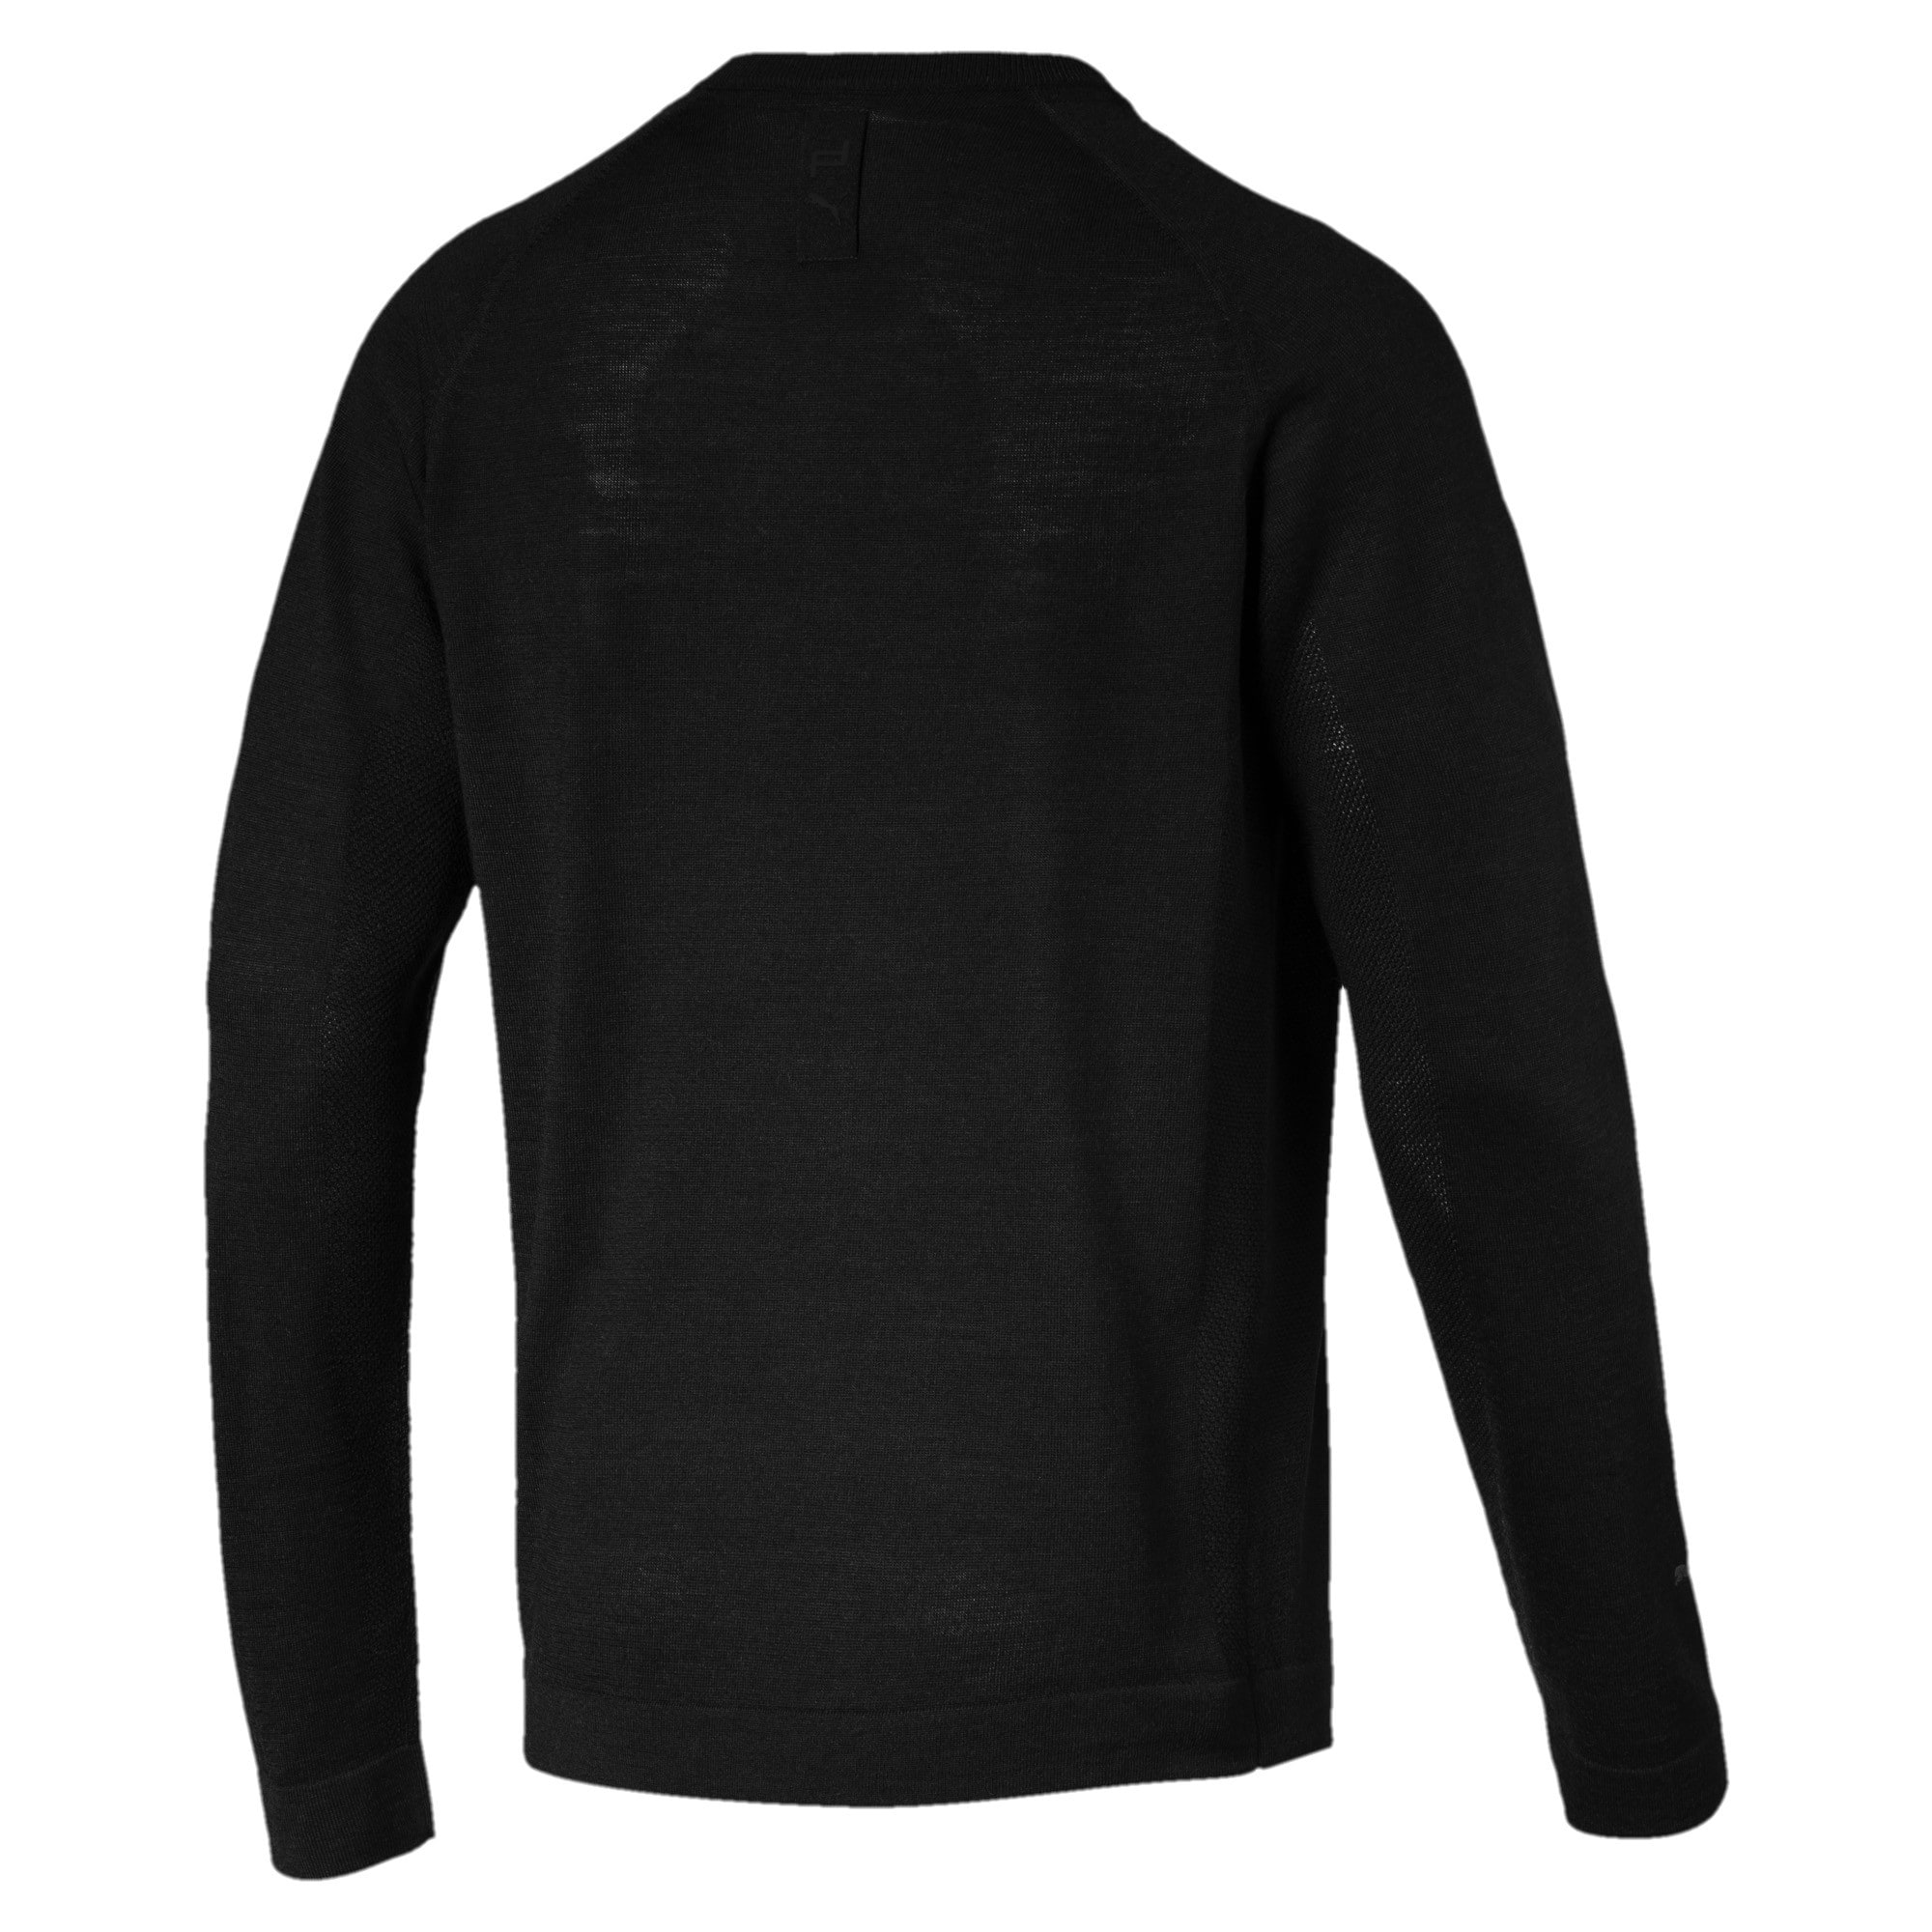 Thumbnail 2 of Porsche Design evoKNIT Herren V-Neck Sweatshirt, Jet Black, medium